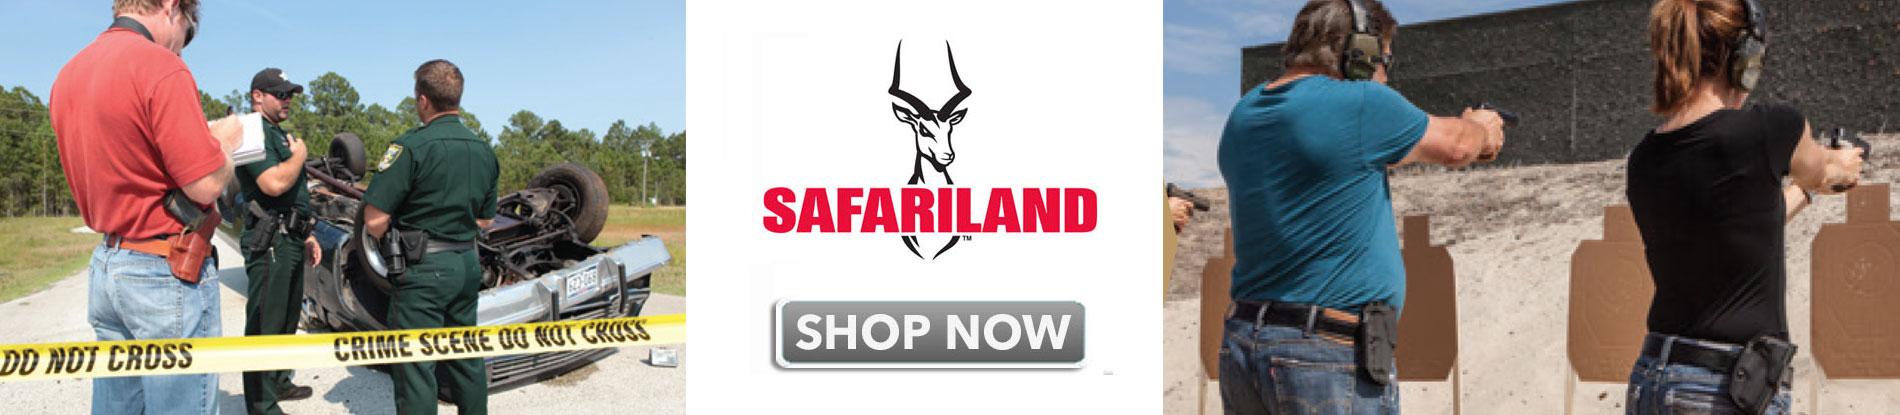 carousel_safariland_new191039153526.jpg